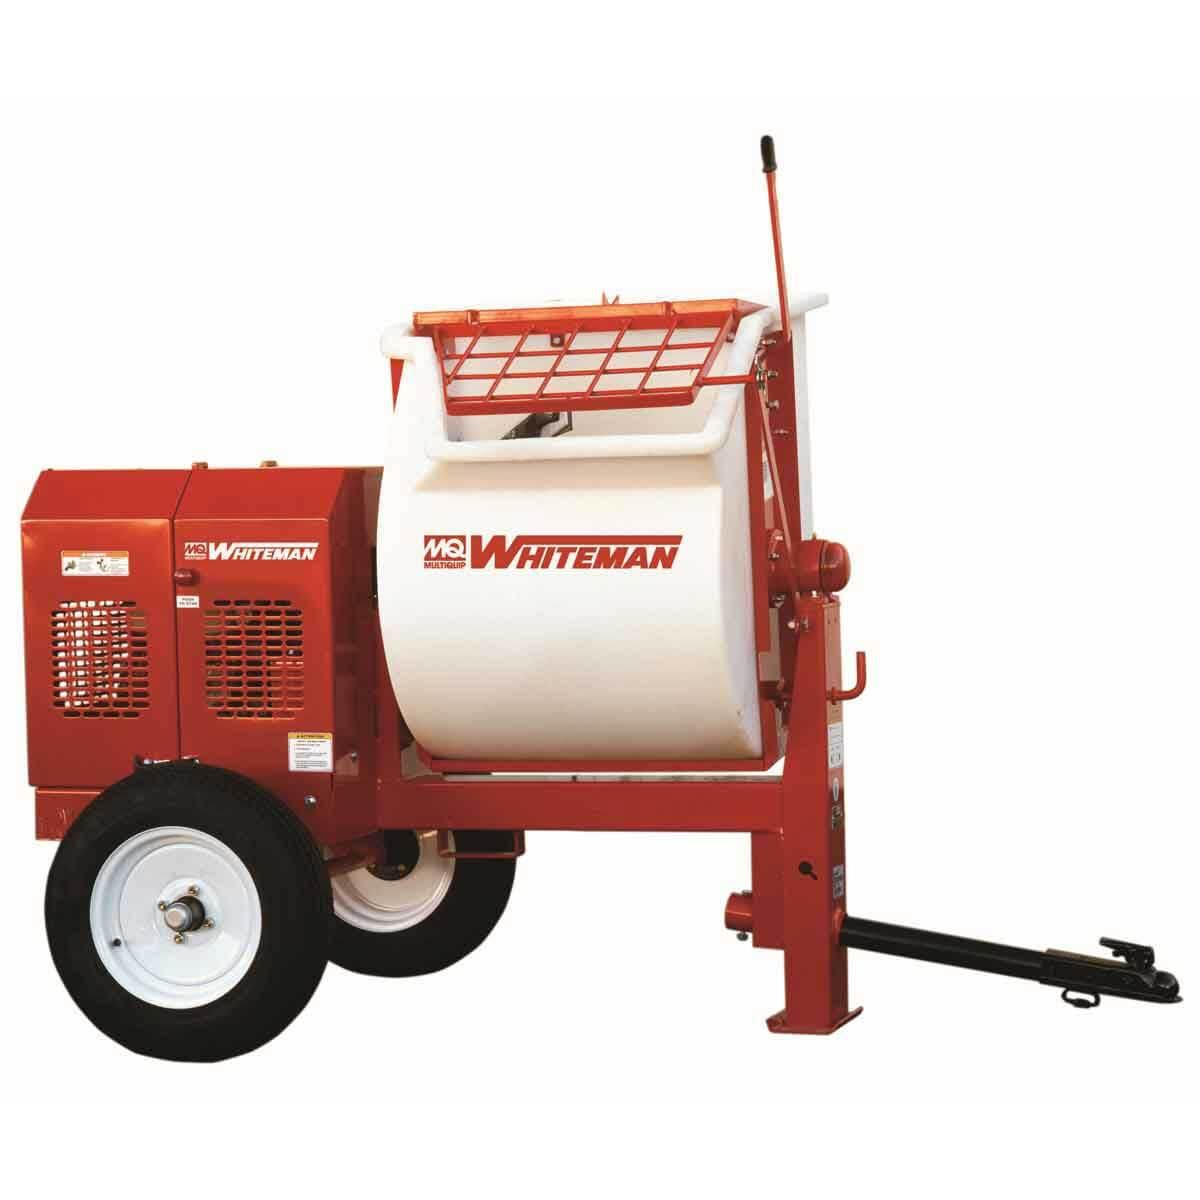 Multiquip Whiteman Wm Poly Mortar Mixers Contractors Direct